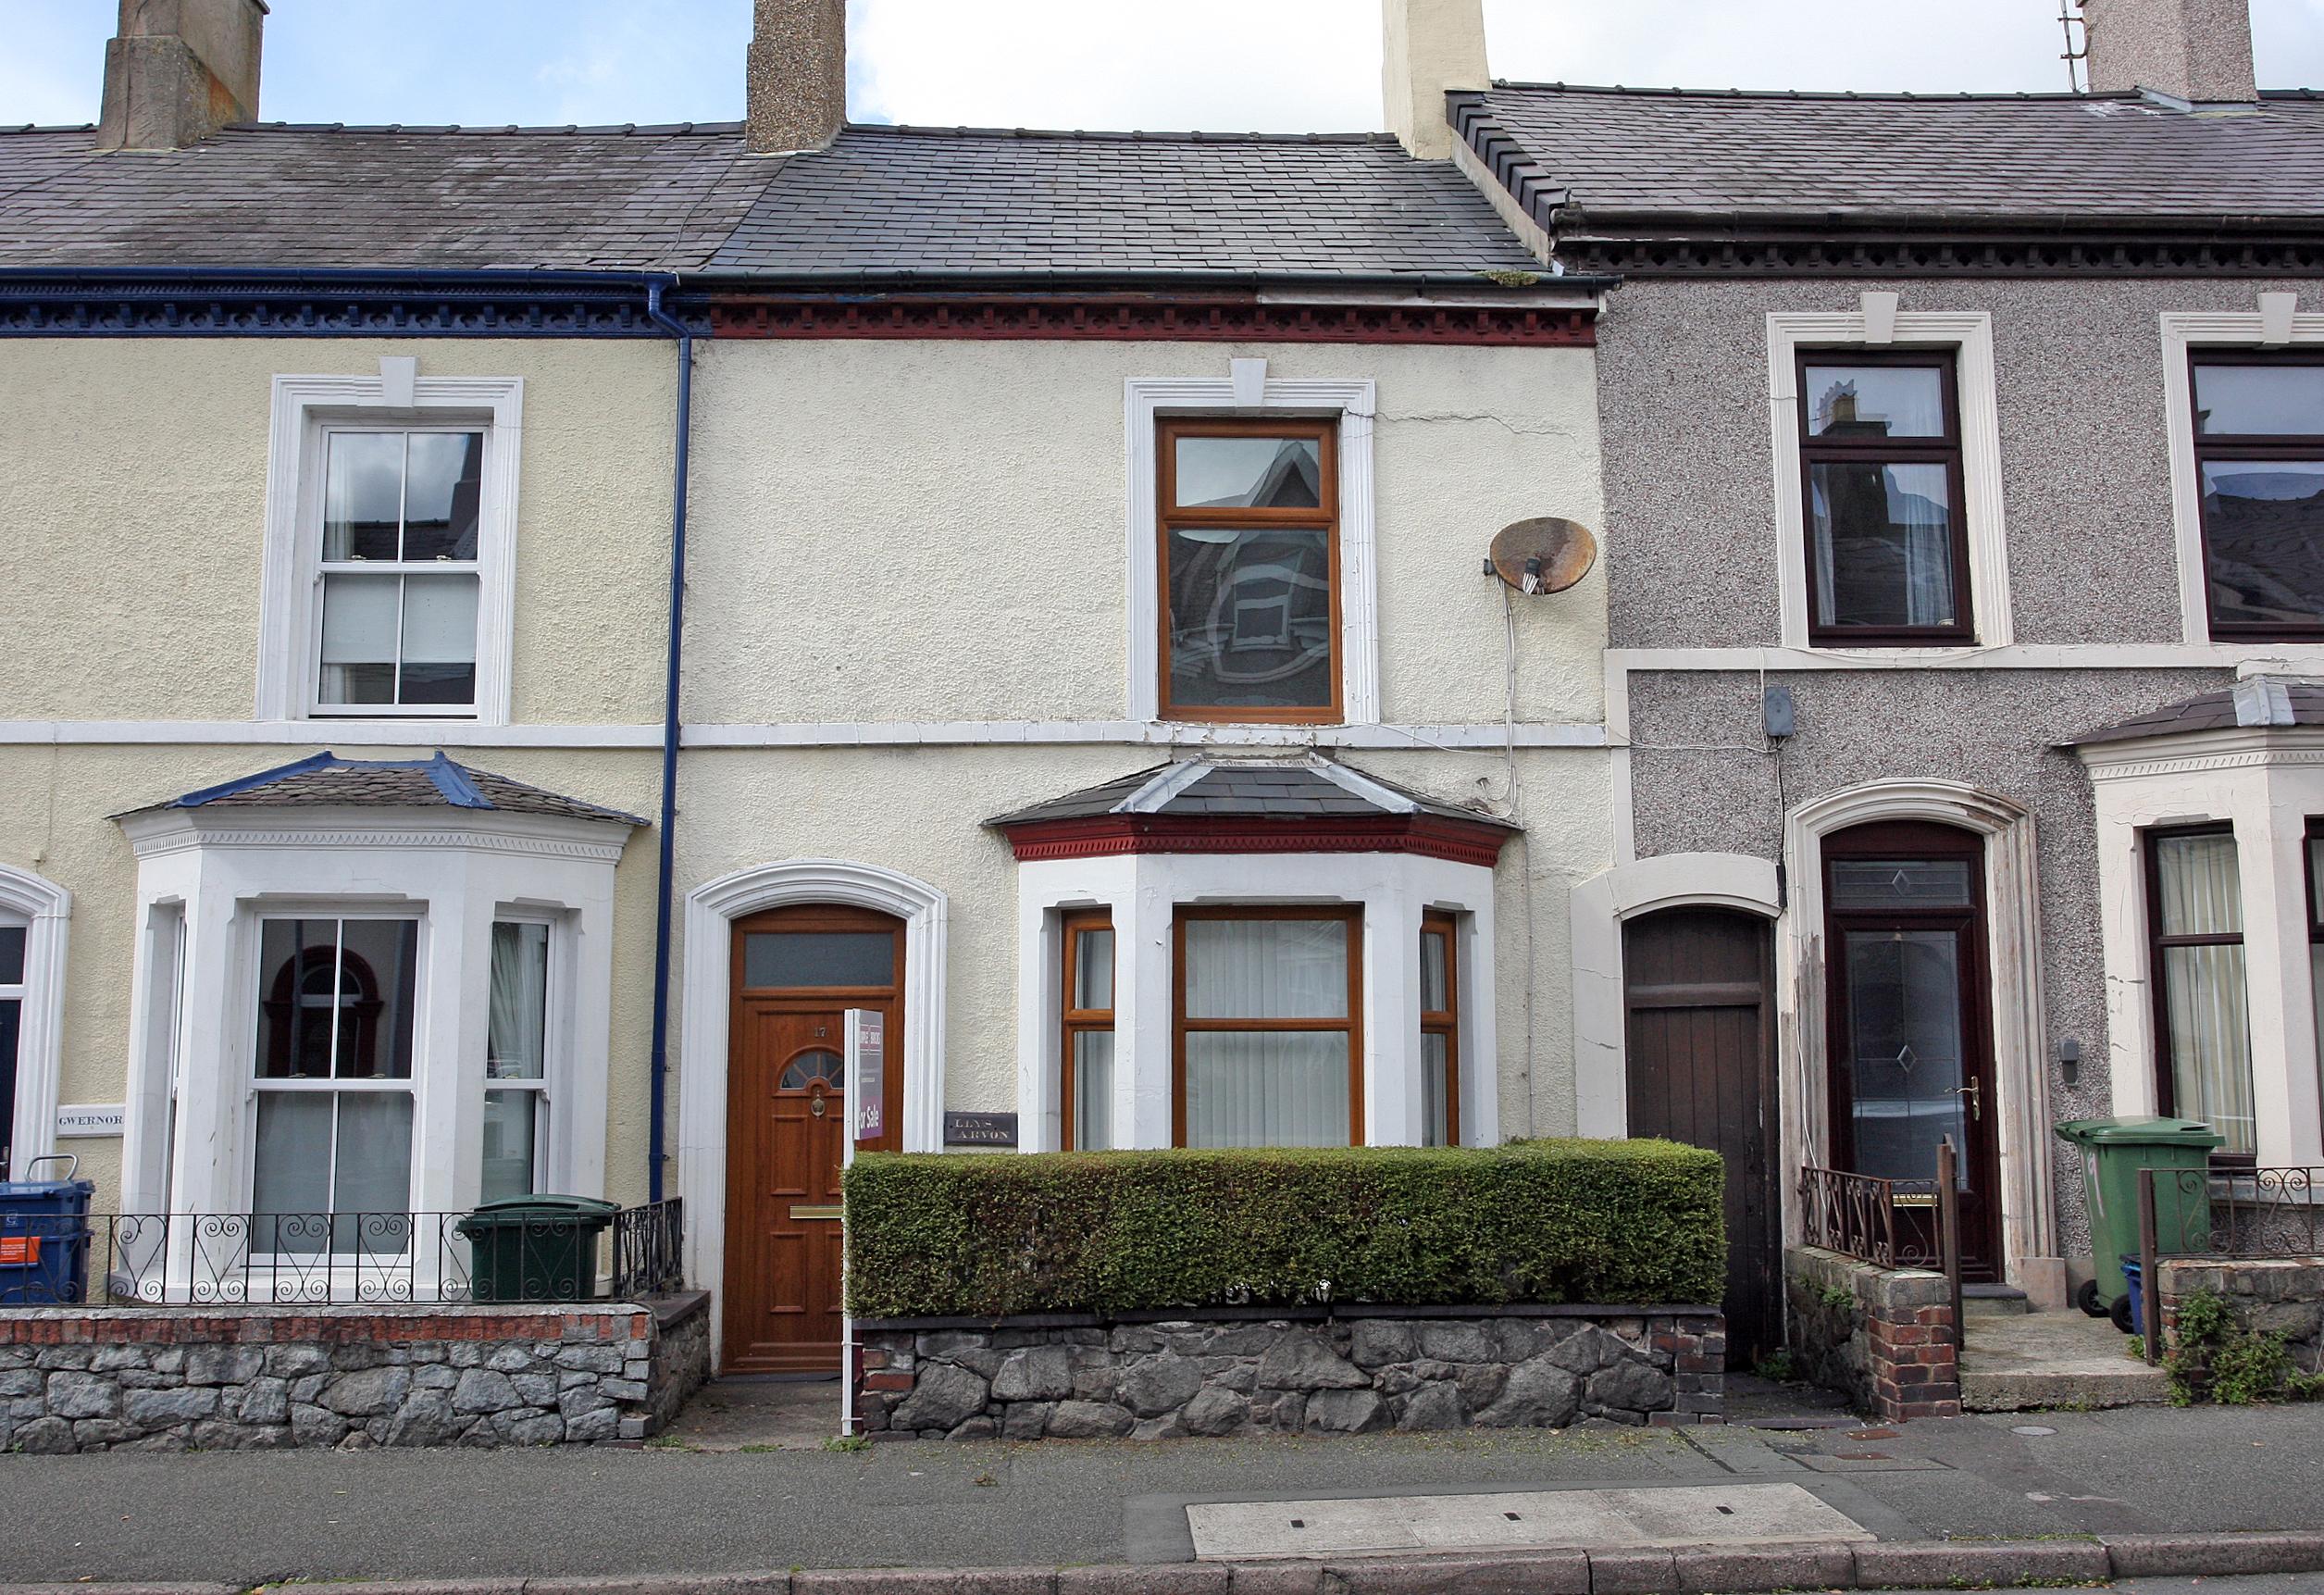 Dinorwic Street, Caernarfon, North Wales